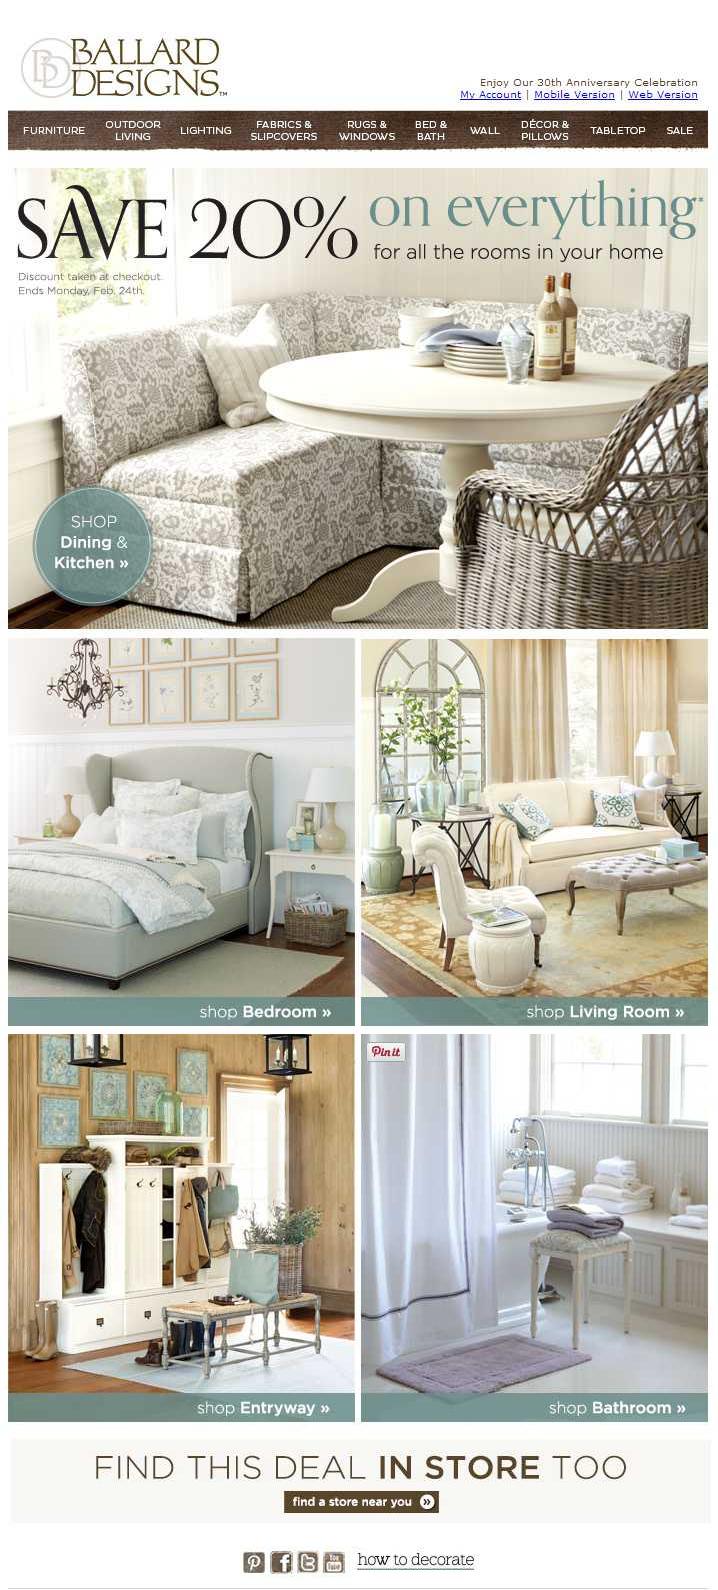 ballard designs email shoproom | email - design/box layout